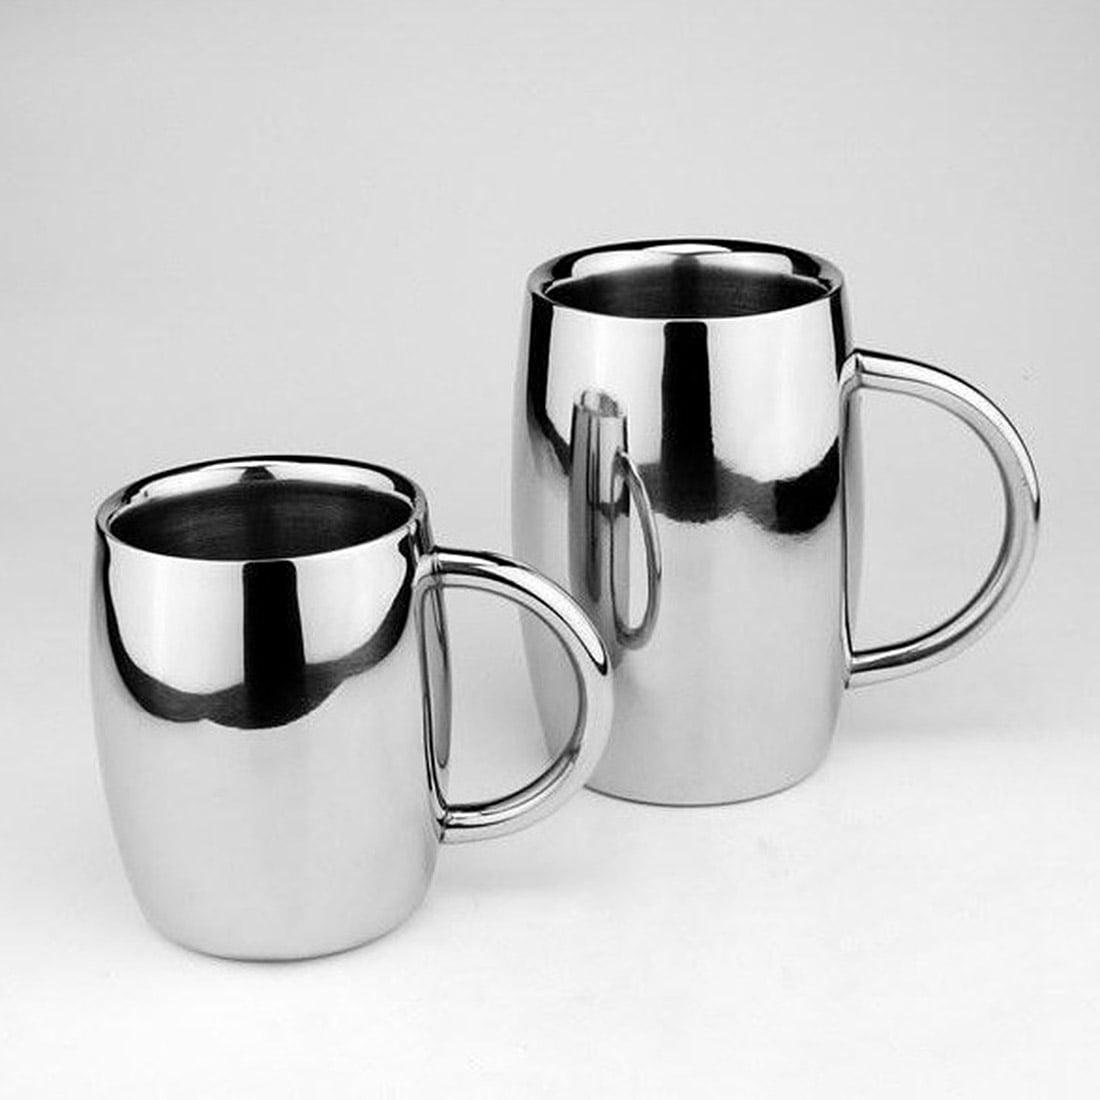 350ML Stainless Steel Beer Mug Double Wall Air Insulated Beer Beverage Mug Coffee Cup by